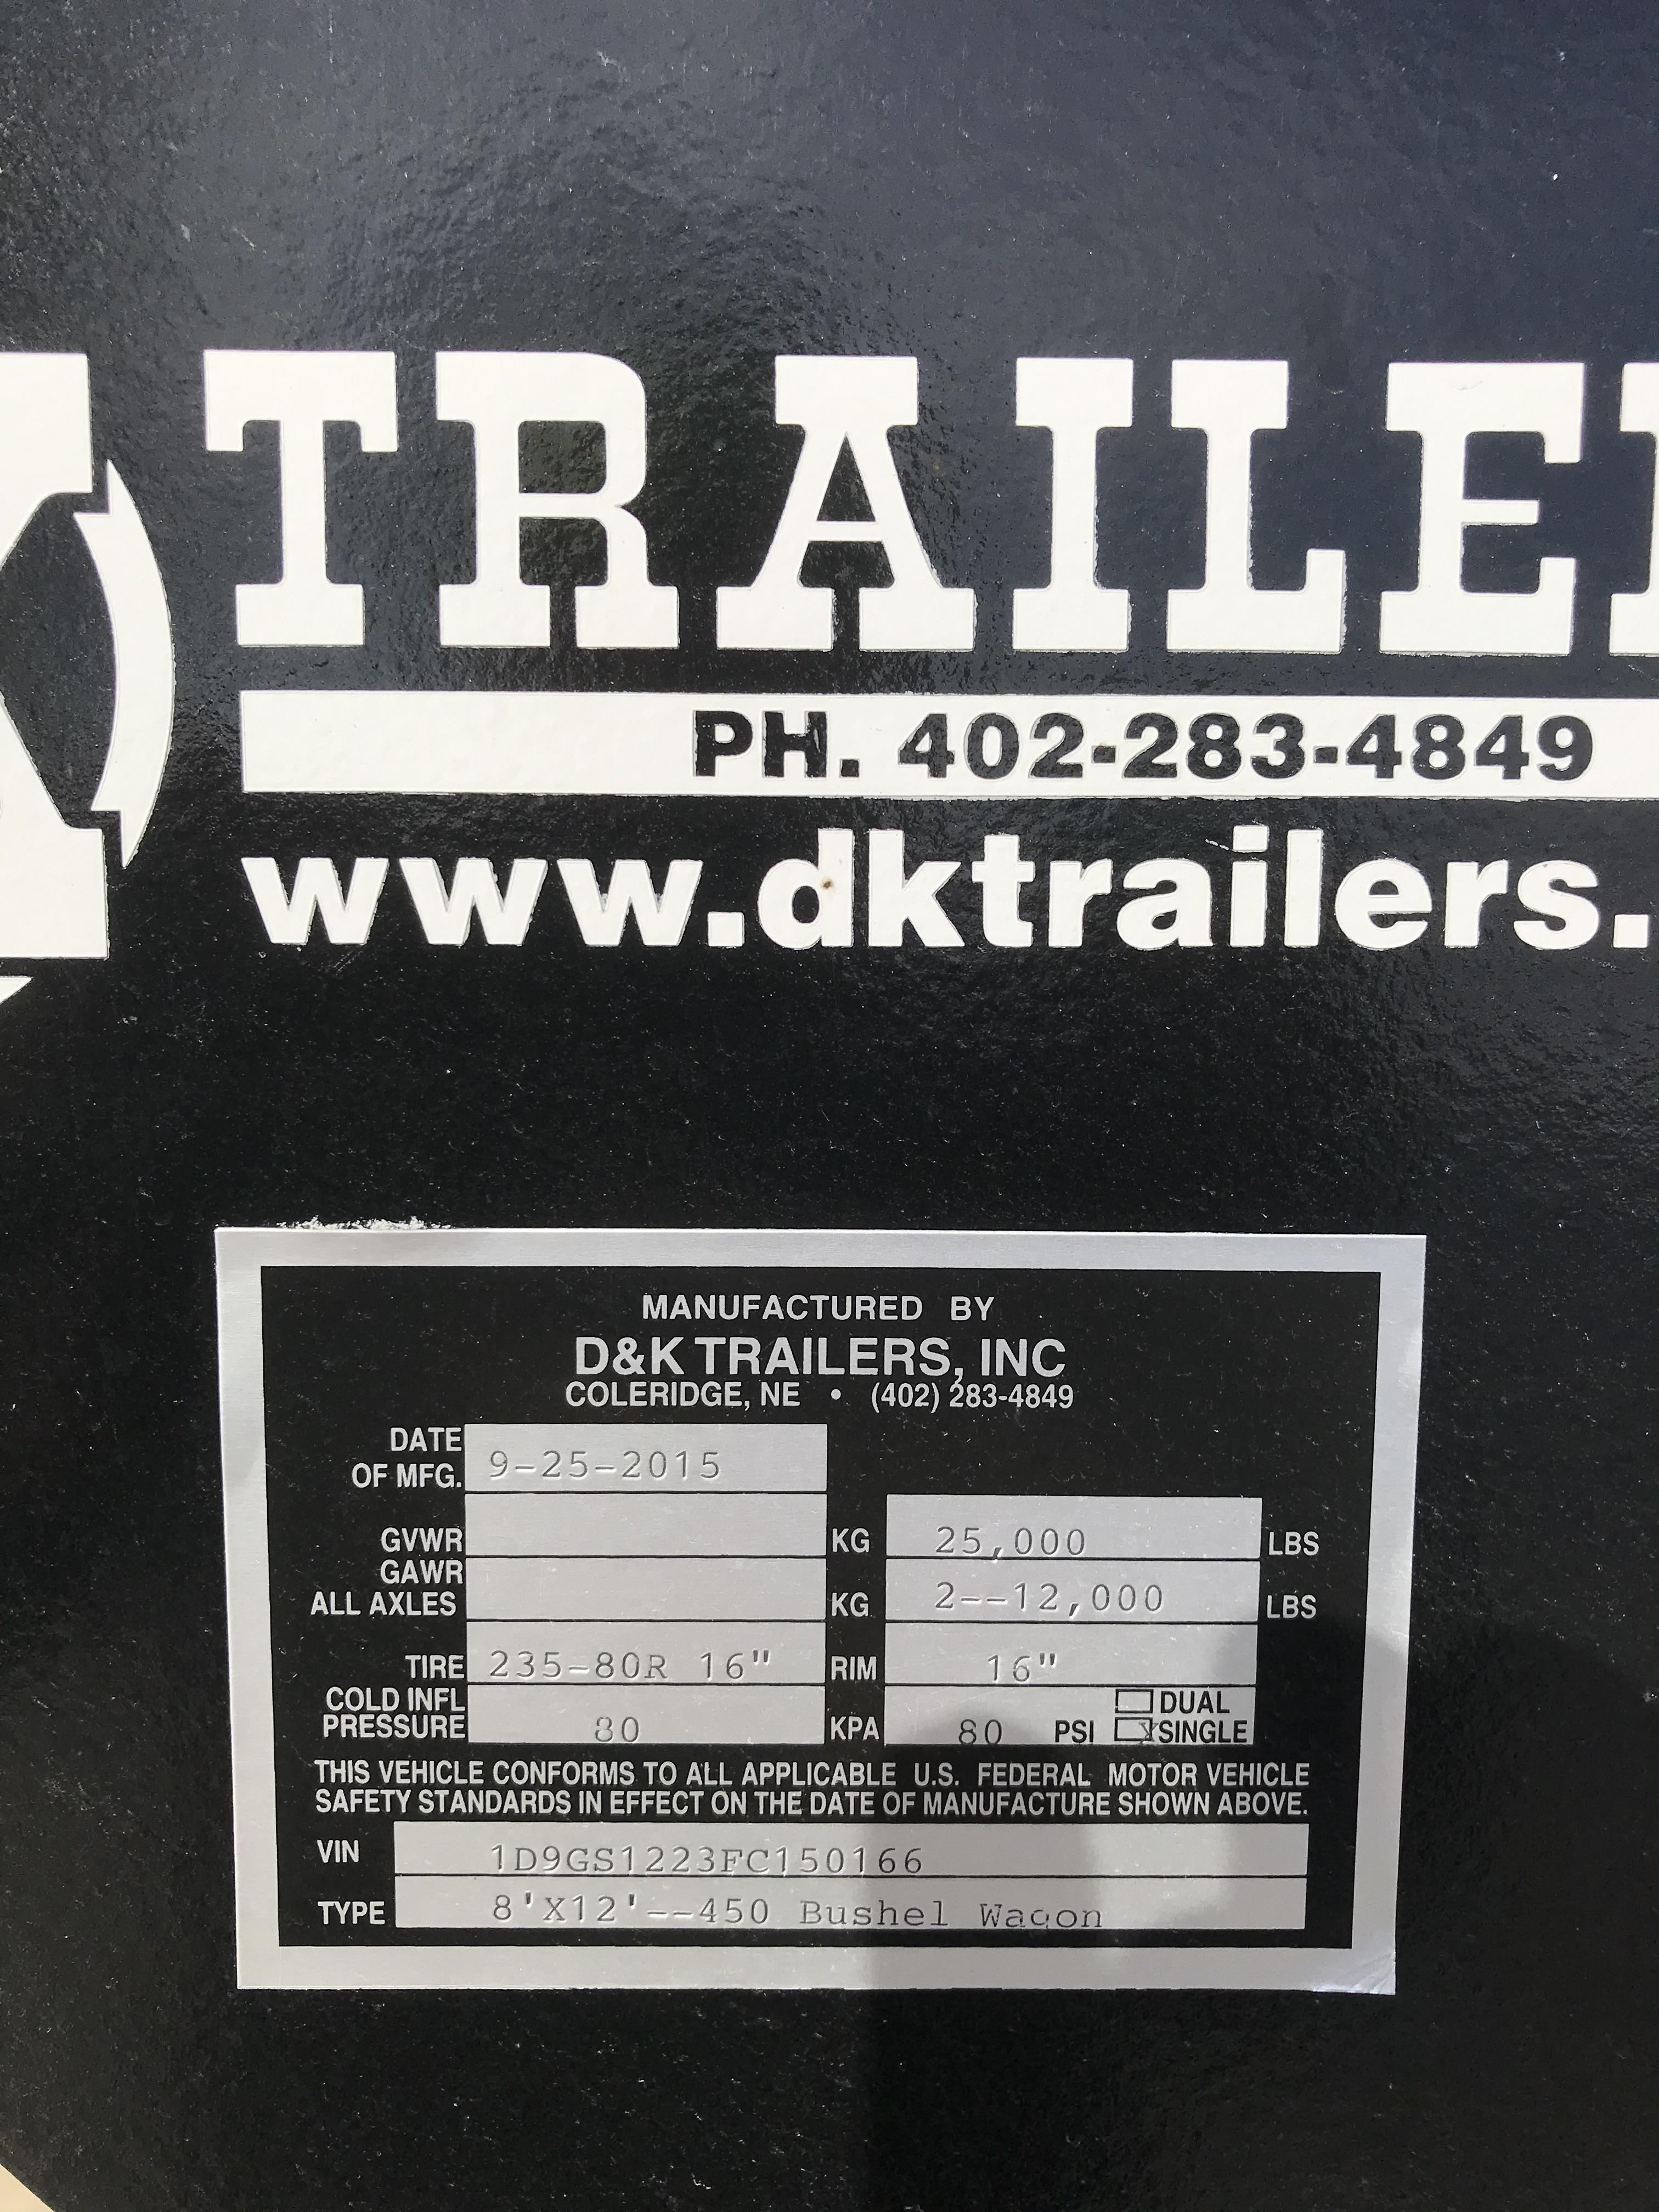 2015 D&K Grain Master 450 Bu. Grain Trailer, Gooseneck Hitch, 2-12 Ton Axles, Twin Jacks, Elec. Over - Image 5 of 5